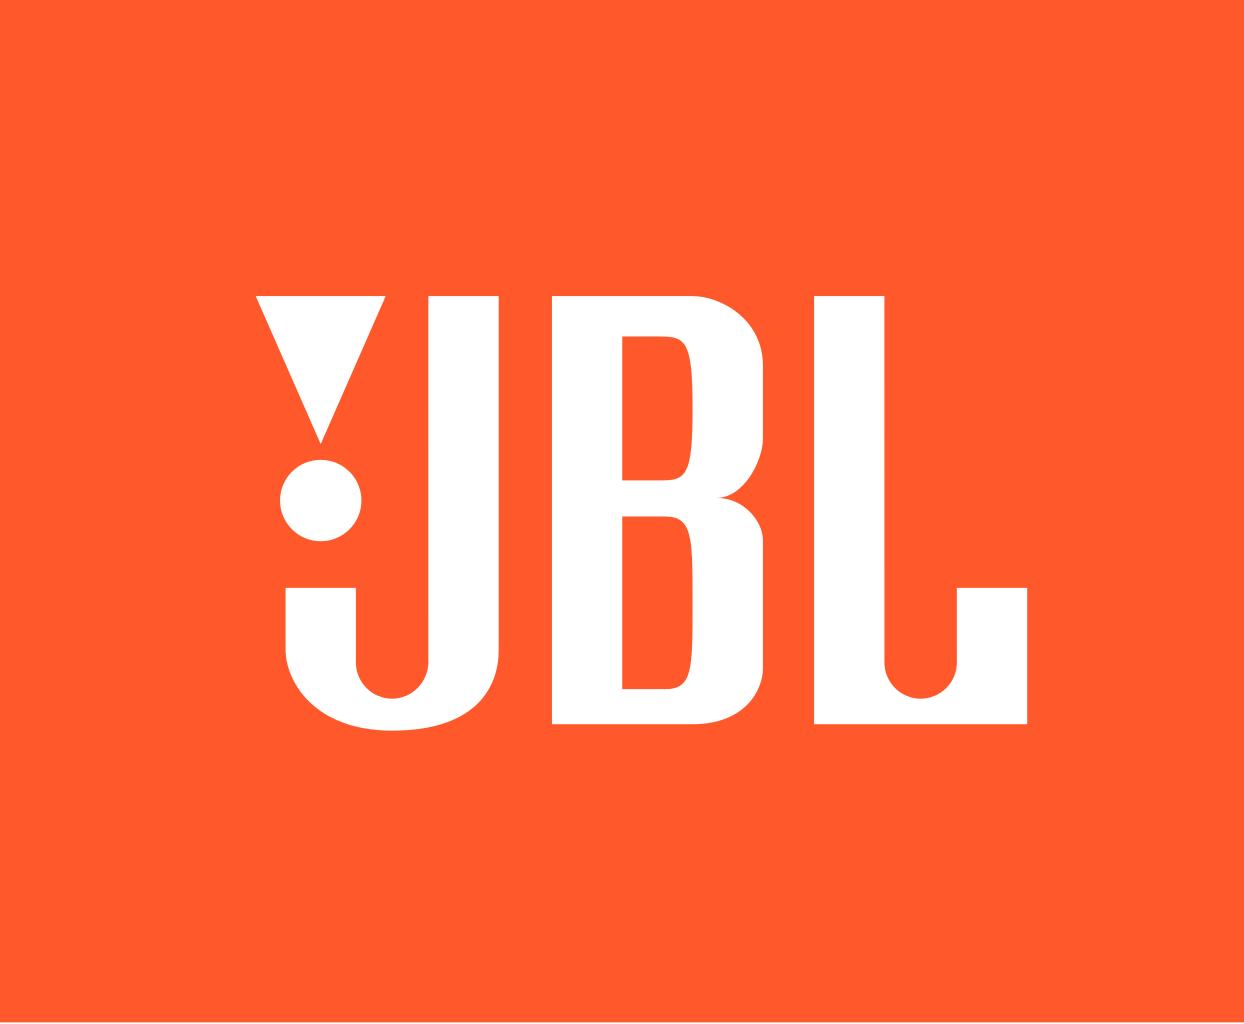 JBLlogo.svg.png